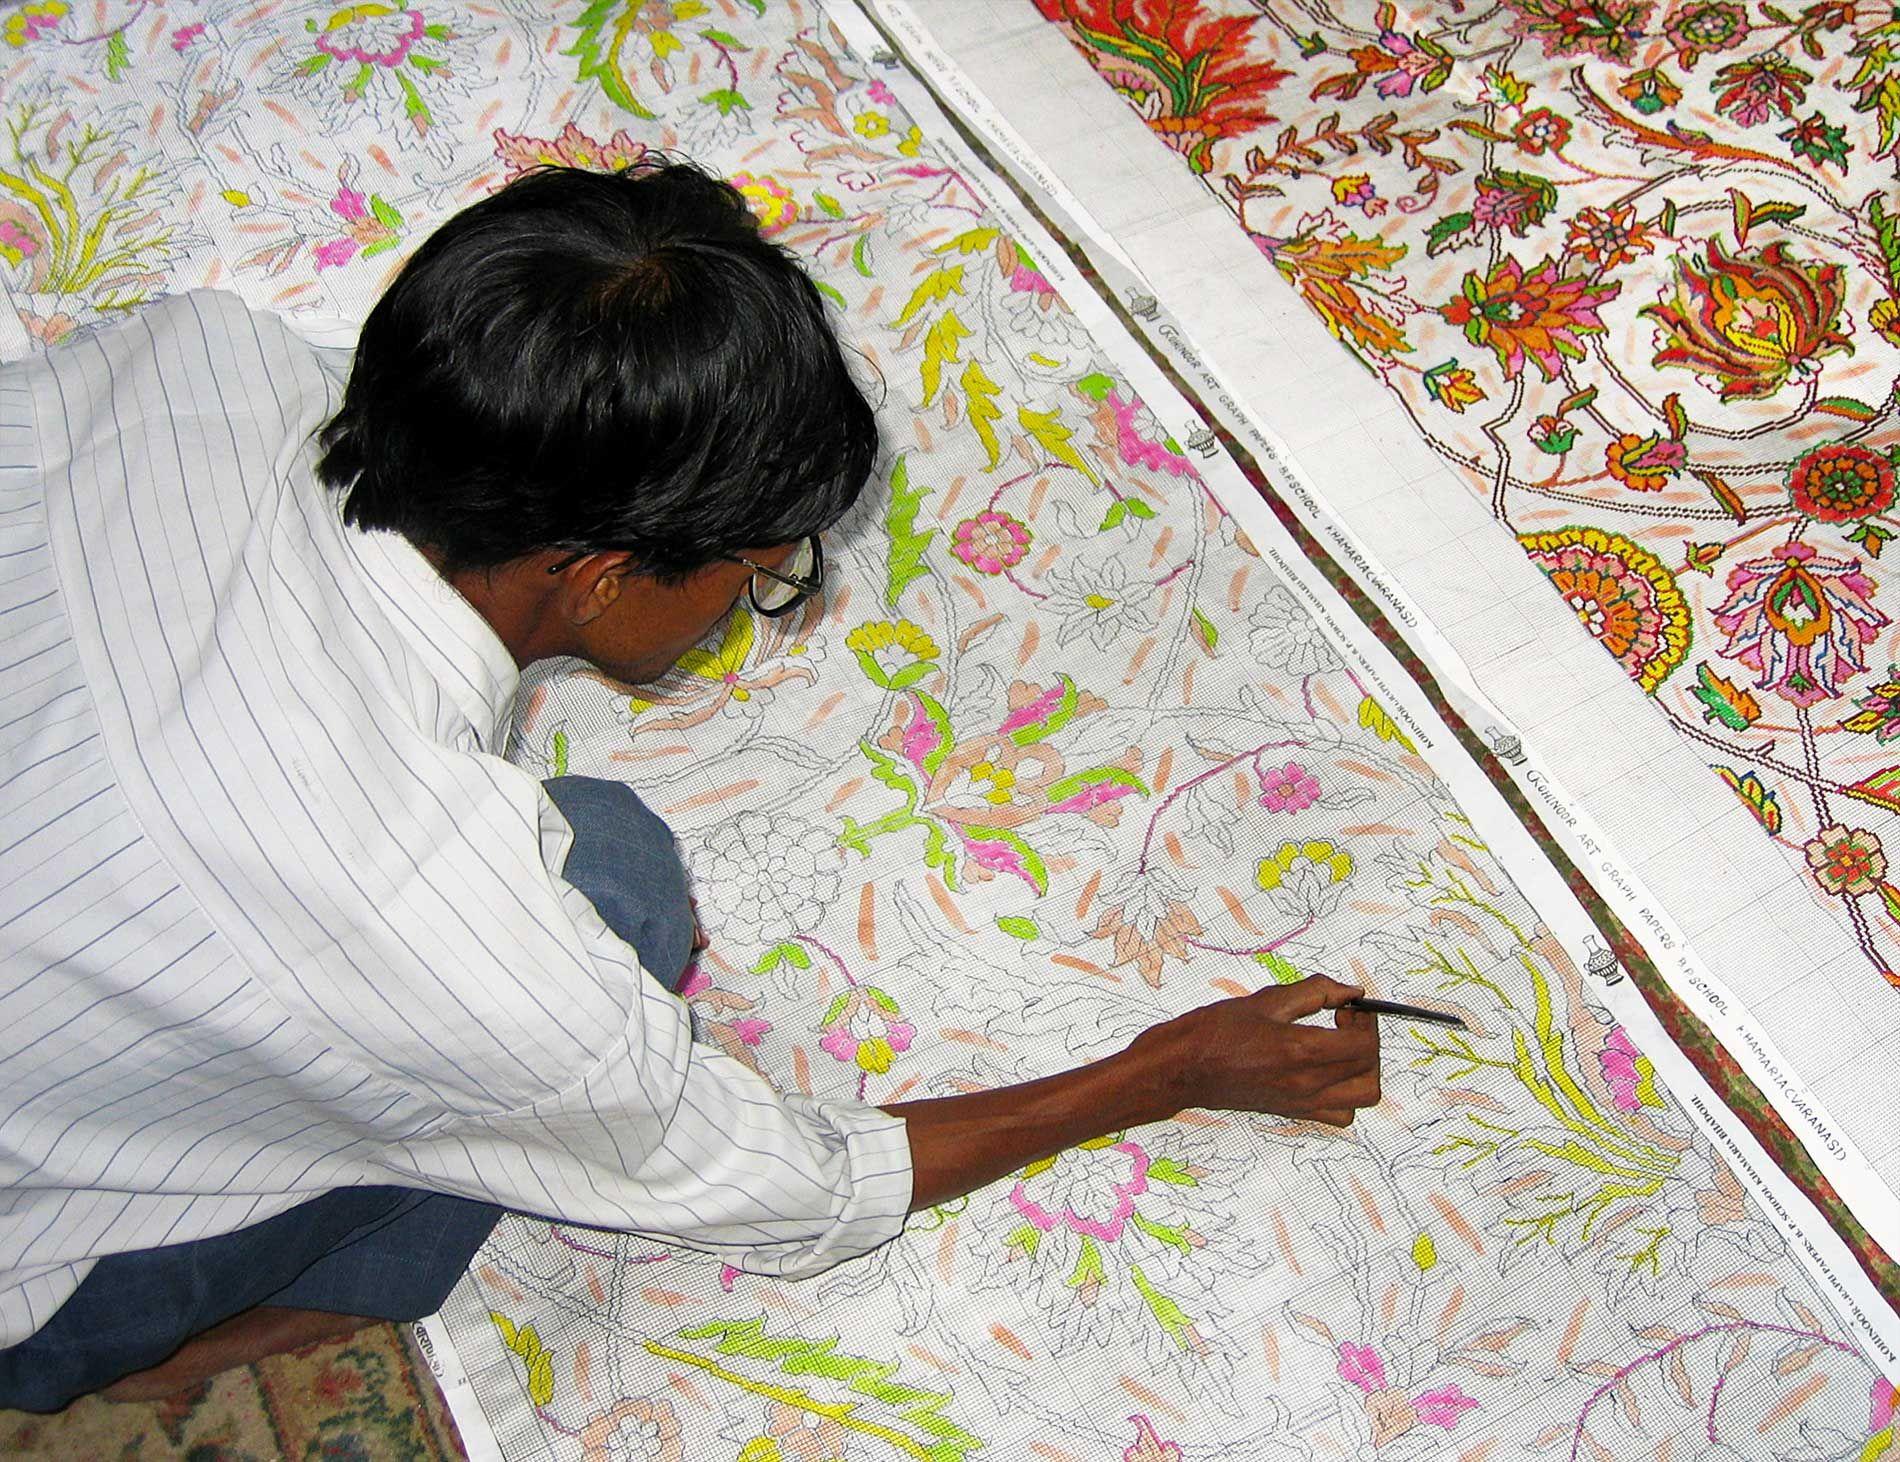 Rug Making Vibrant Rugs Artist At Work Rug Making